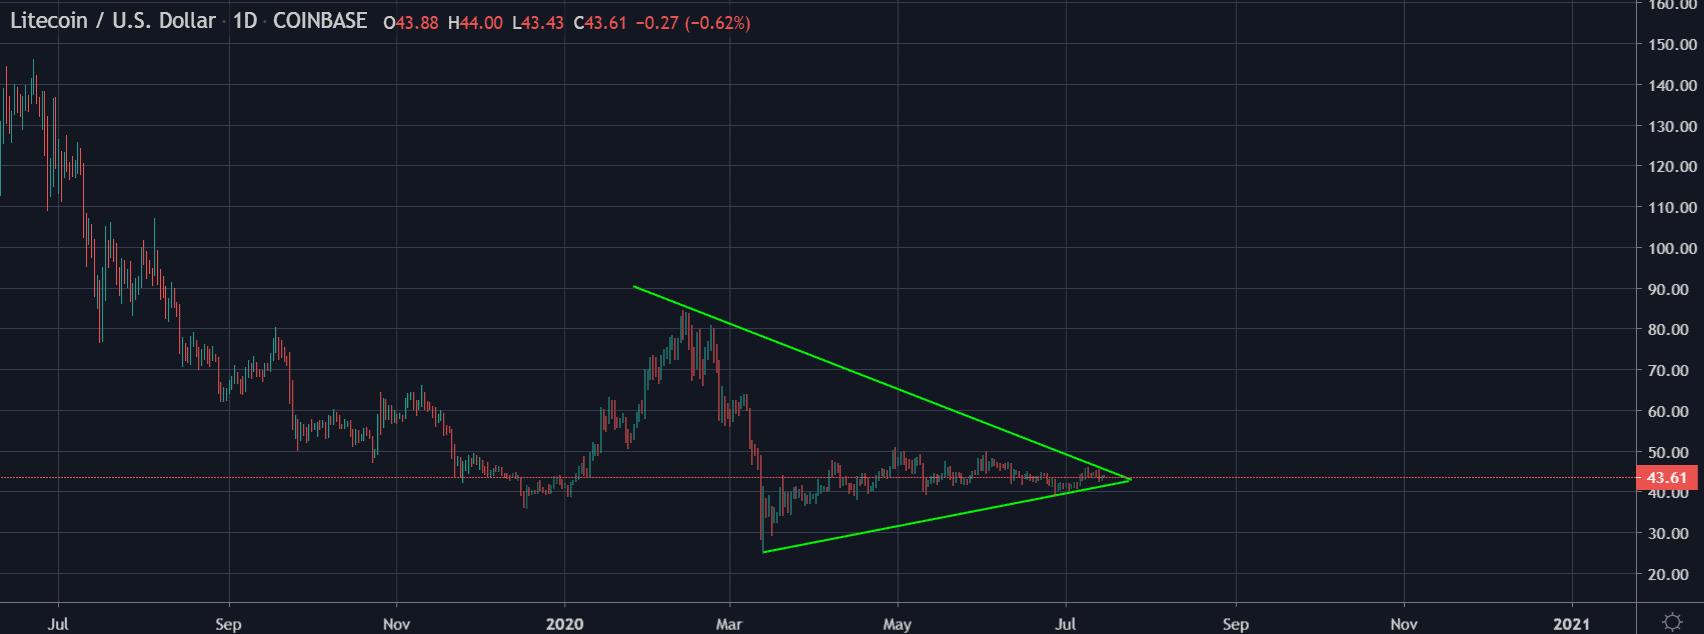 Litecoin price chart 3 - 15 July